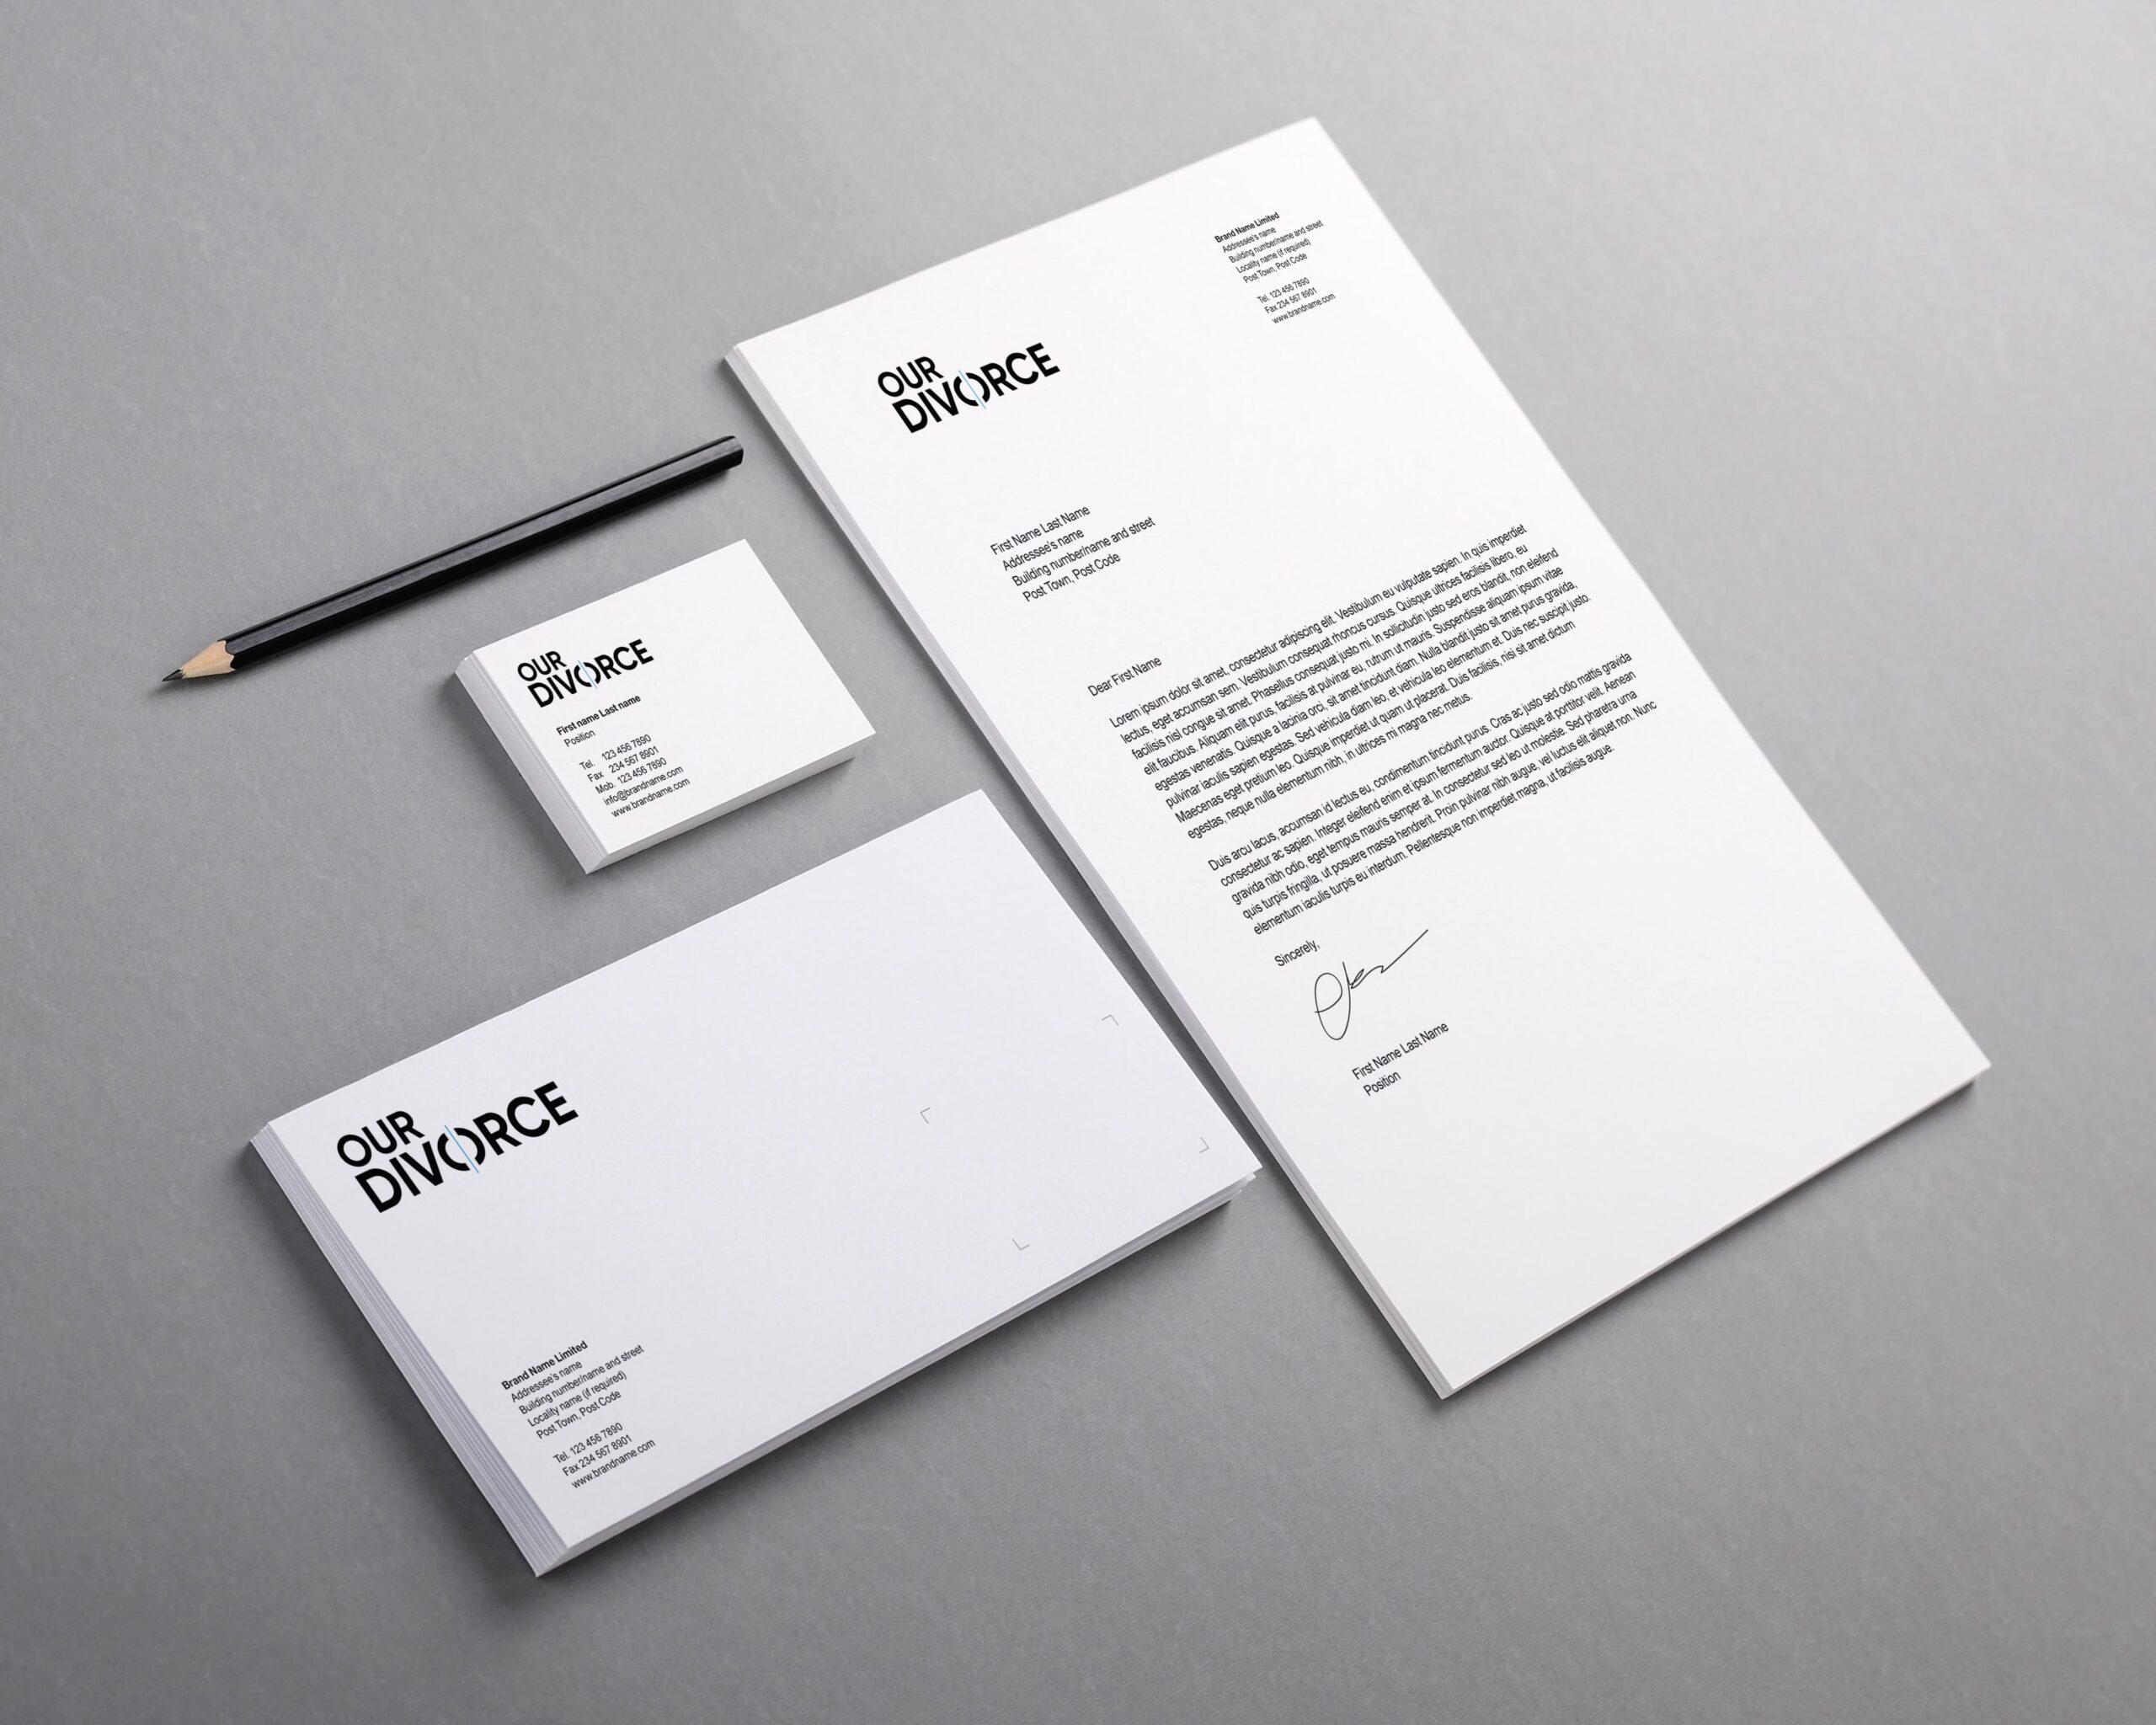 OurDivorce brand materials mockup